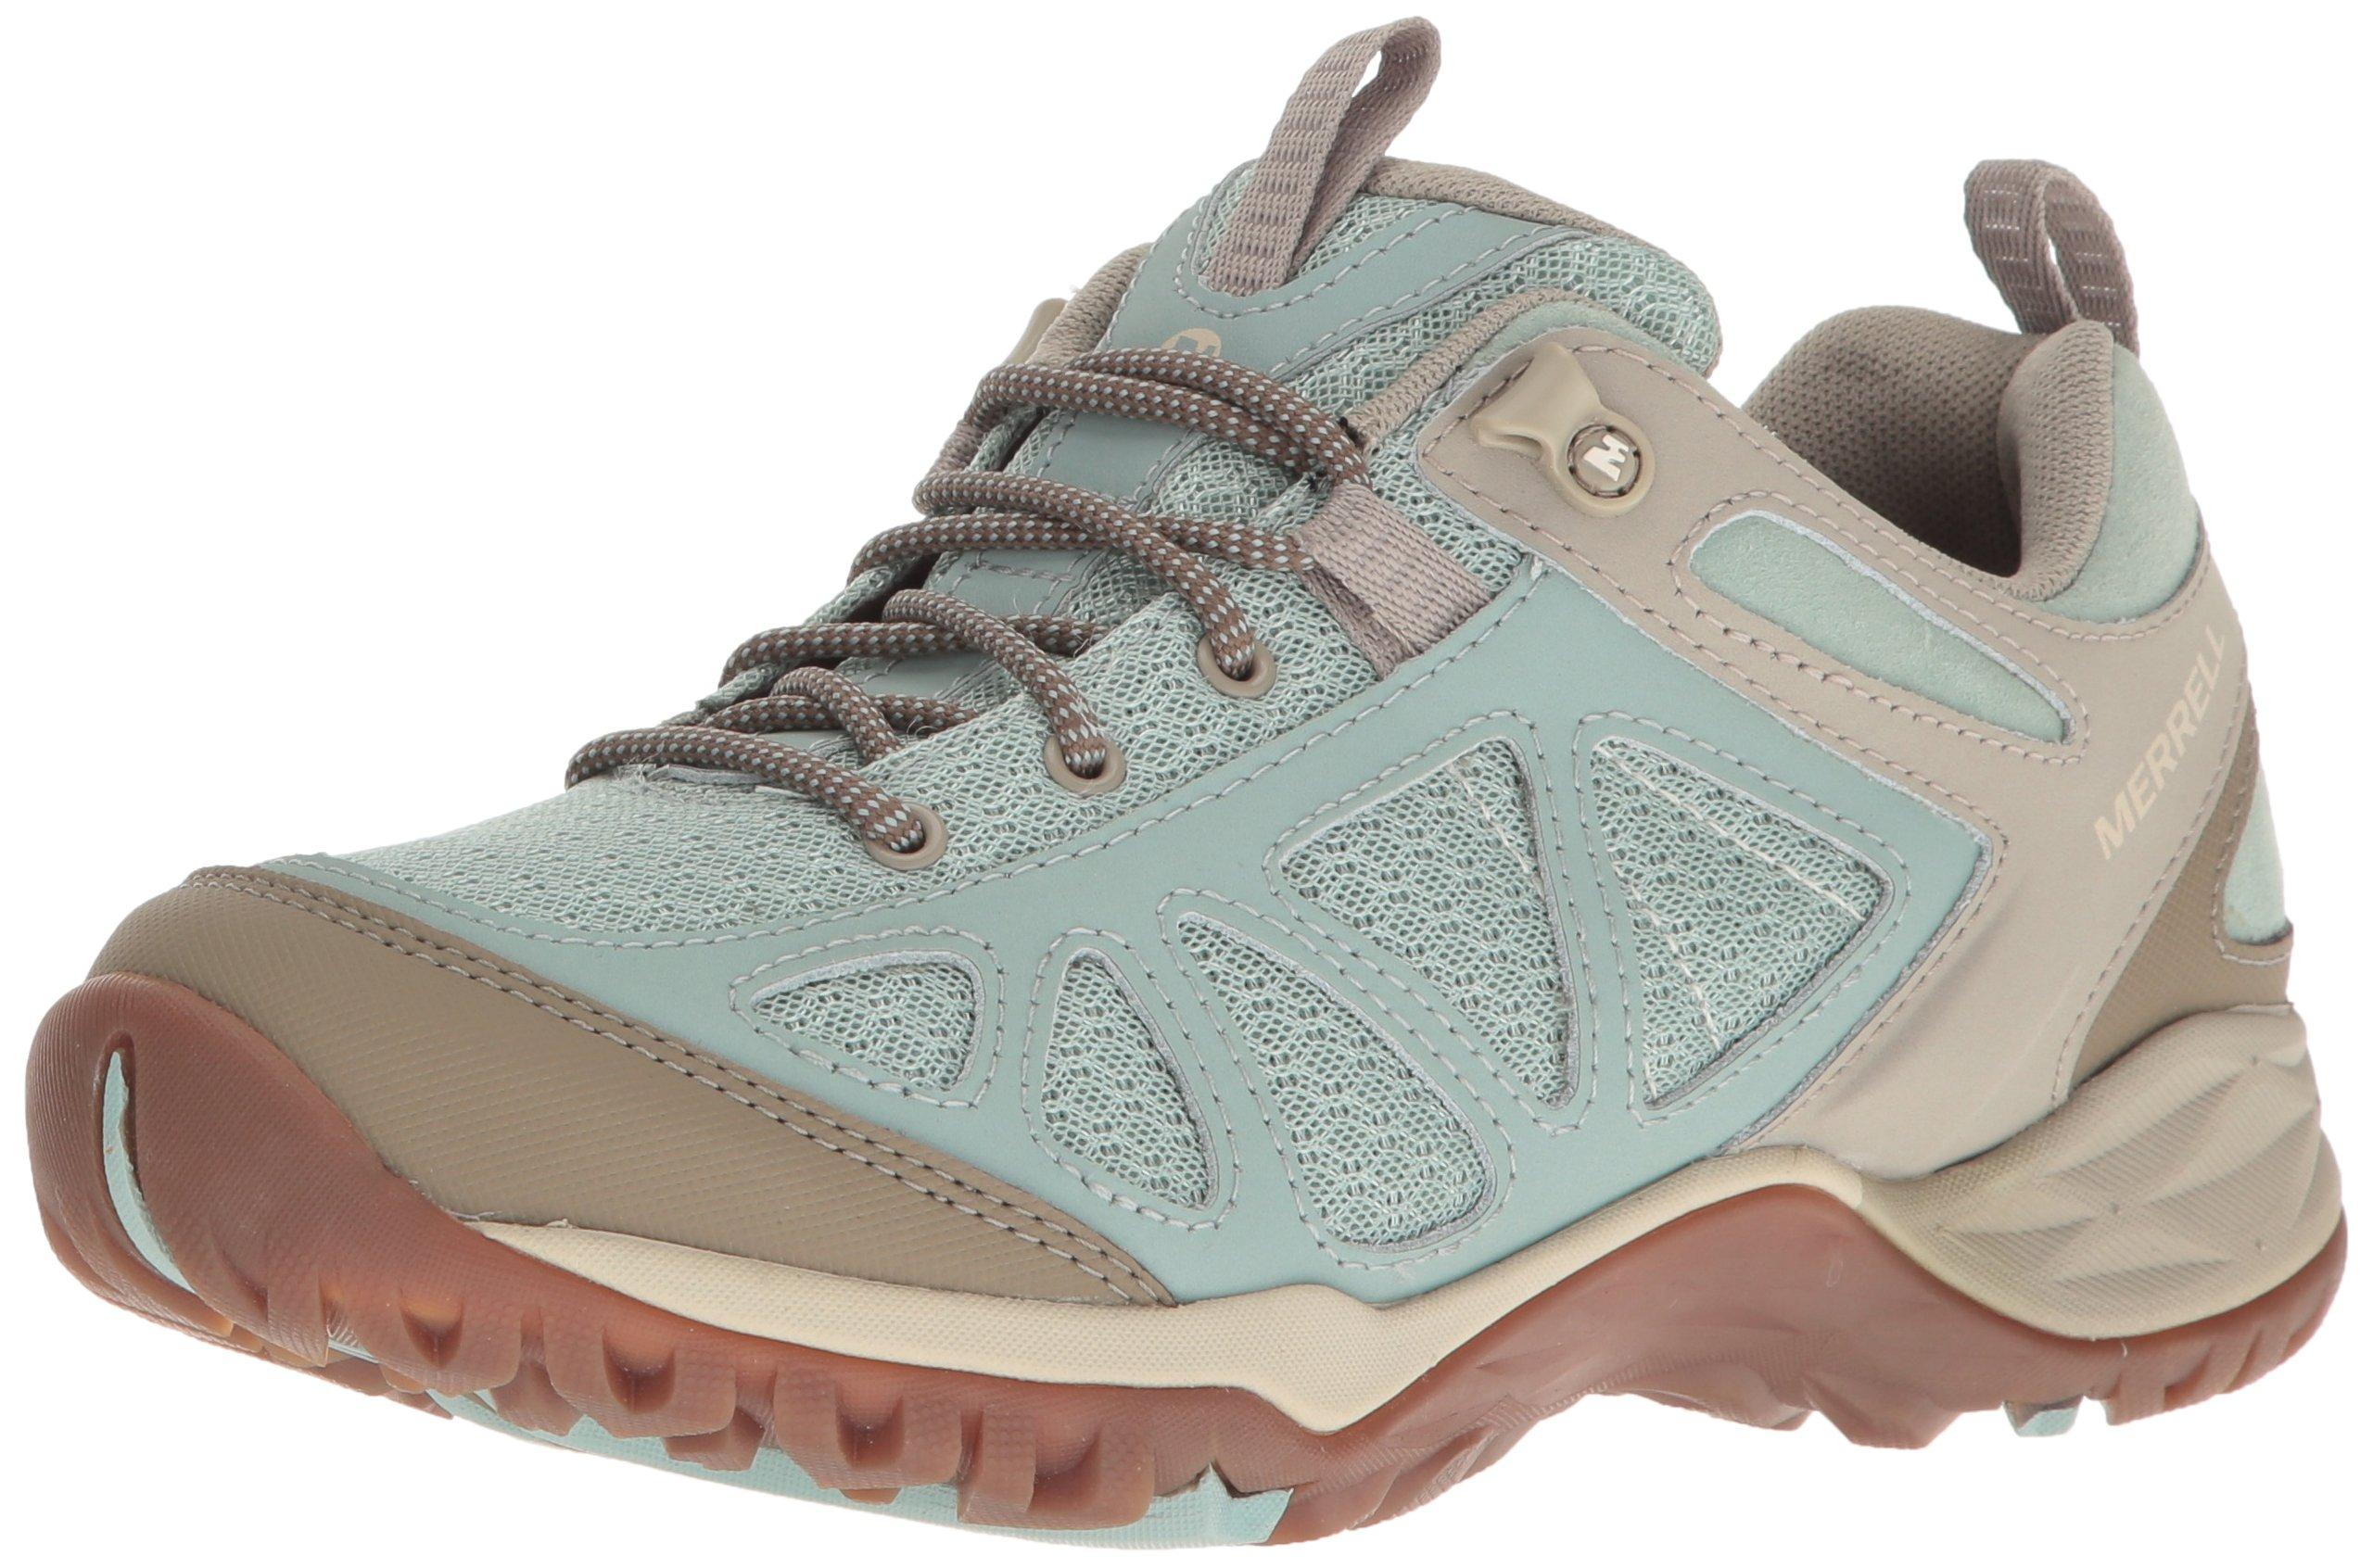 Merrell Women's Siren Sport Q2 Hiking Shoe, Blue Surf, 5 M US